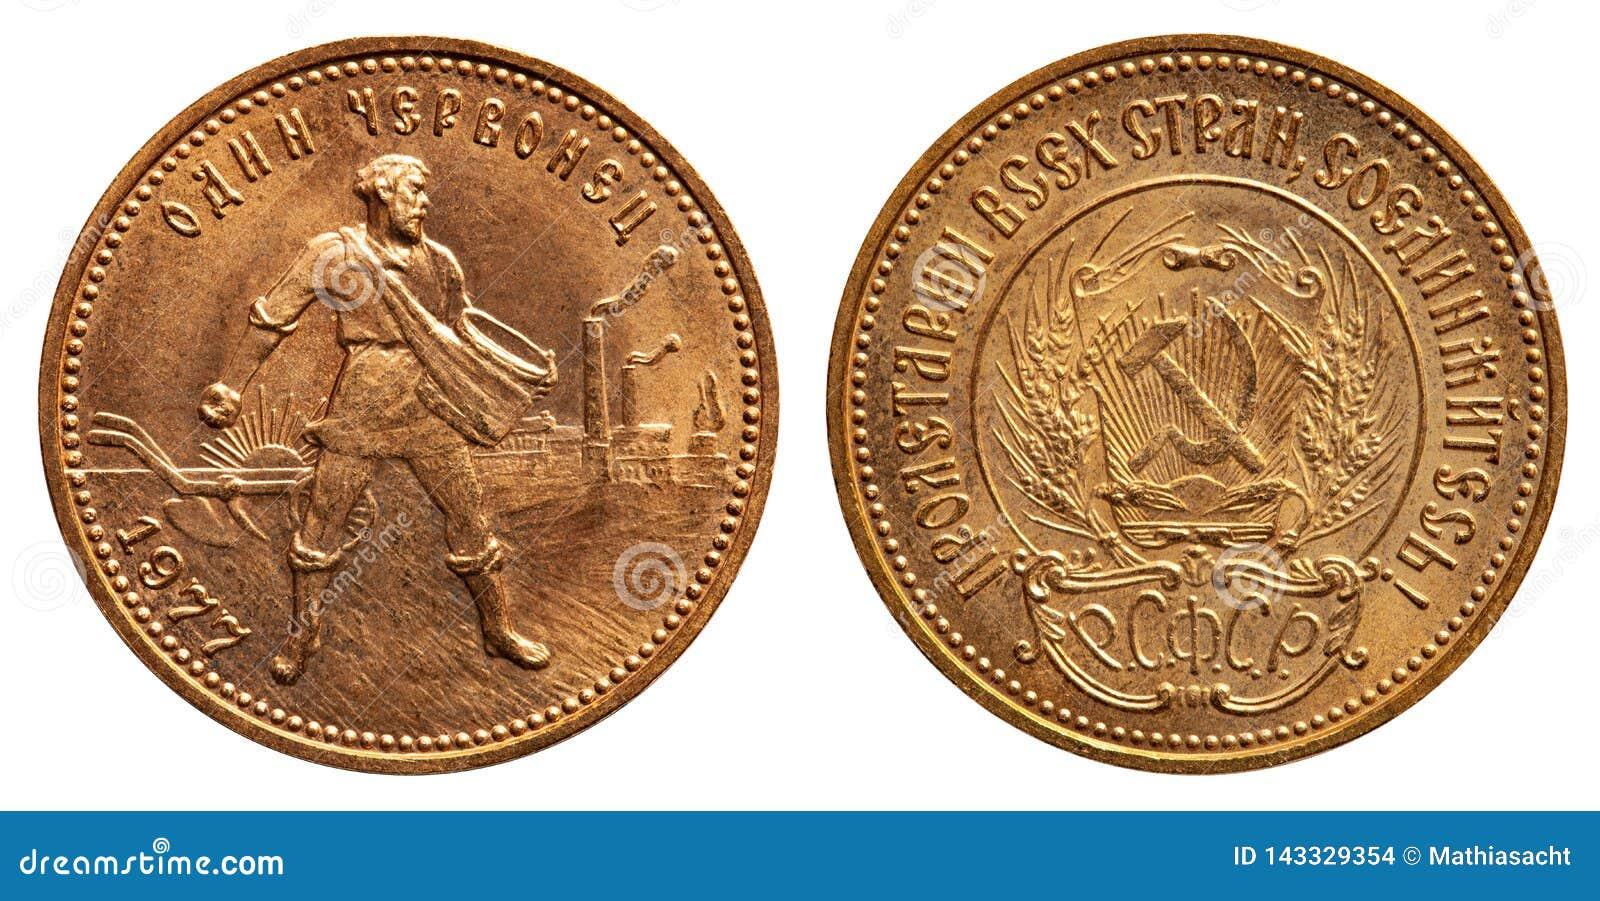 Russia gold coin Chervonetz 1977